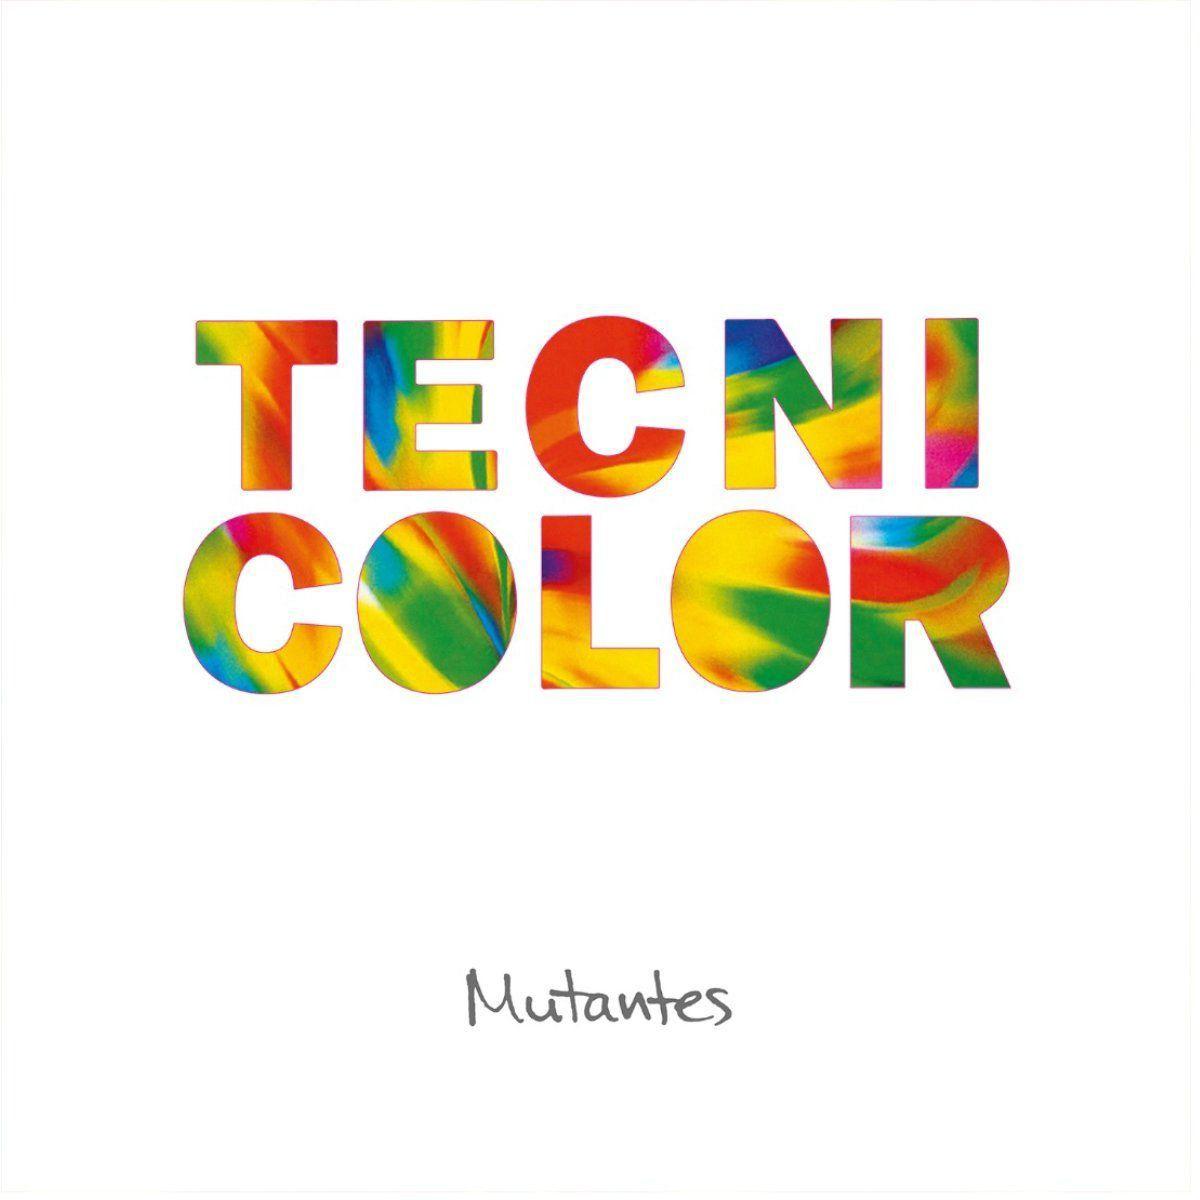 LP Os Mutantes Tecnicolor  - bandUP Store Marketplace